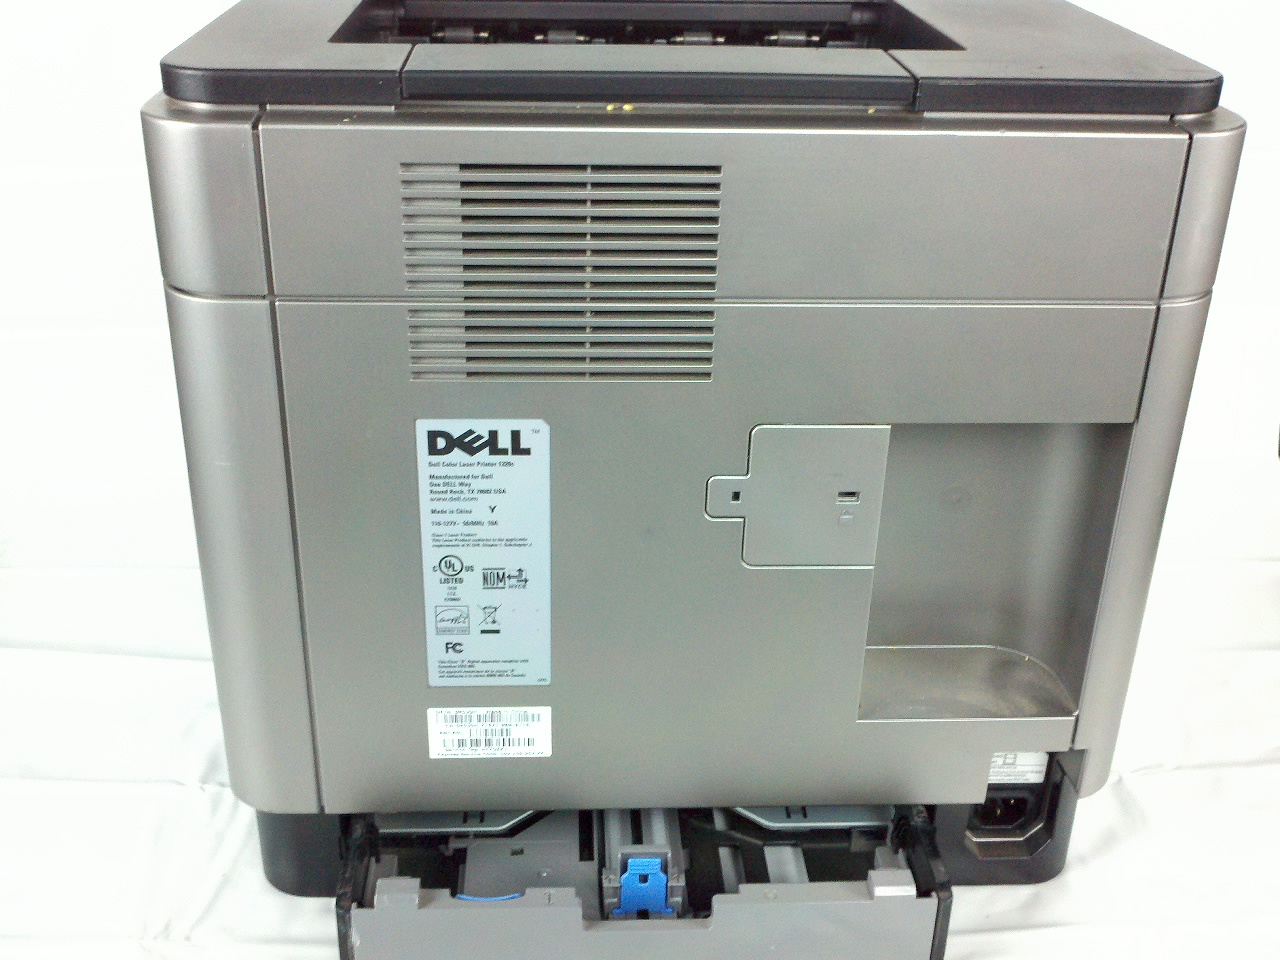 Dell Color Laser 1320c Driver